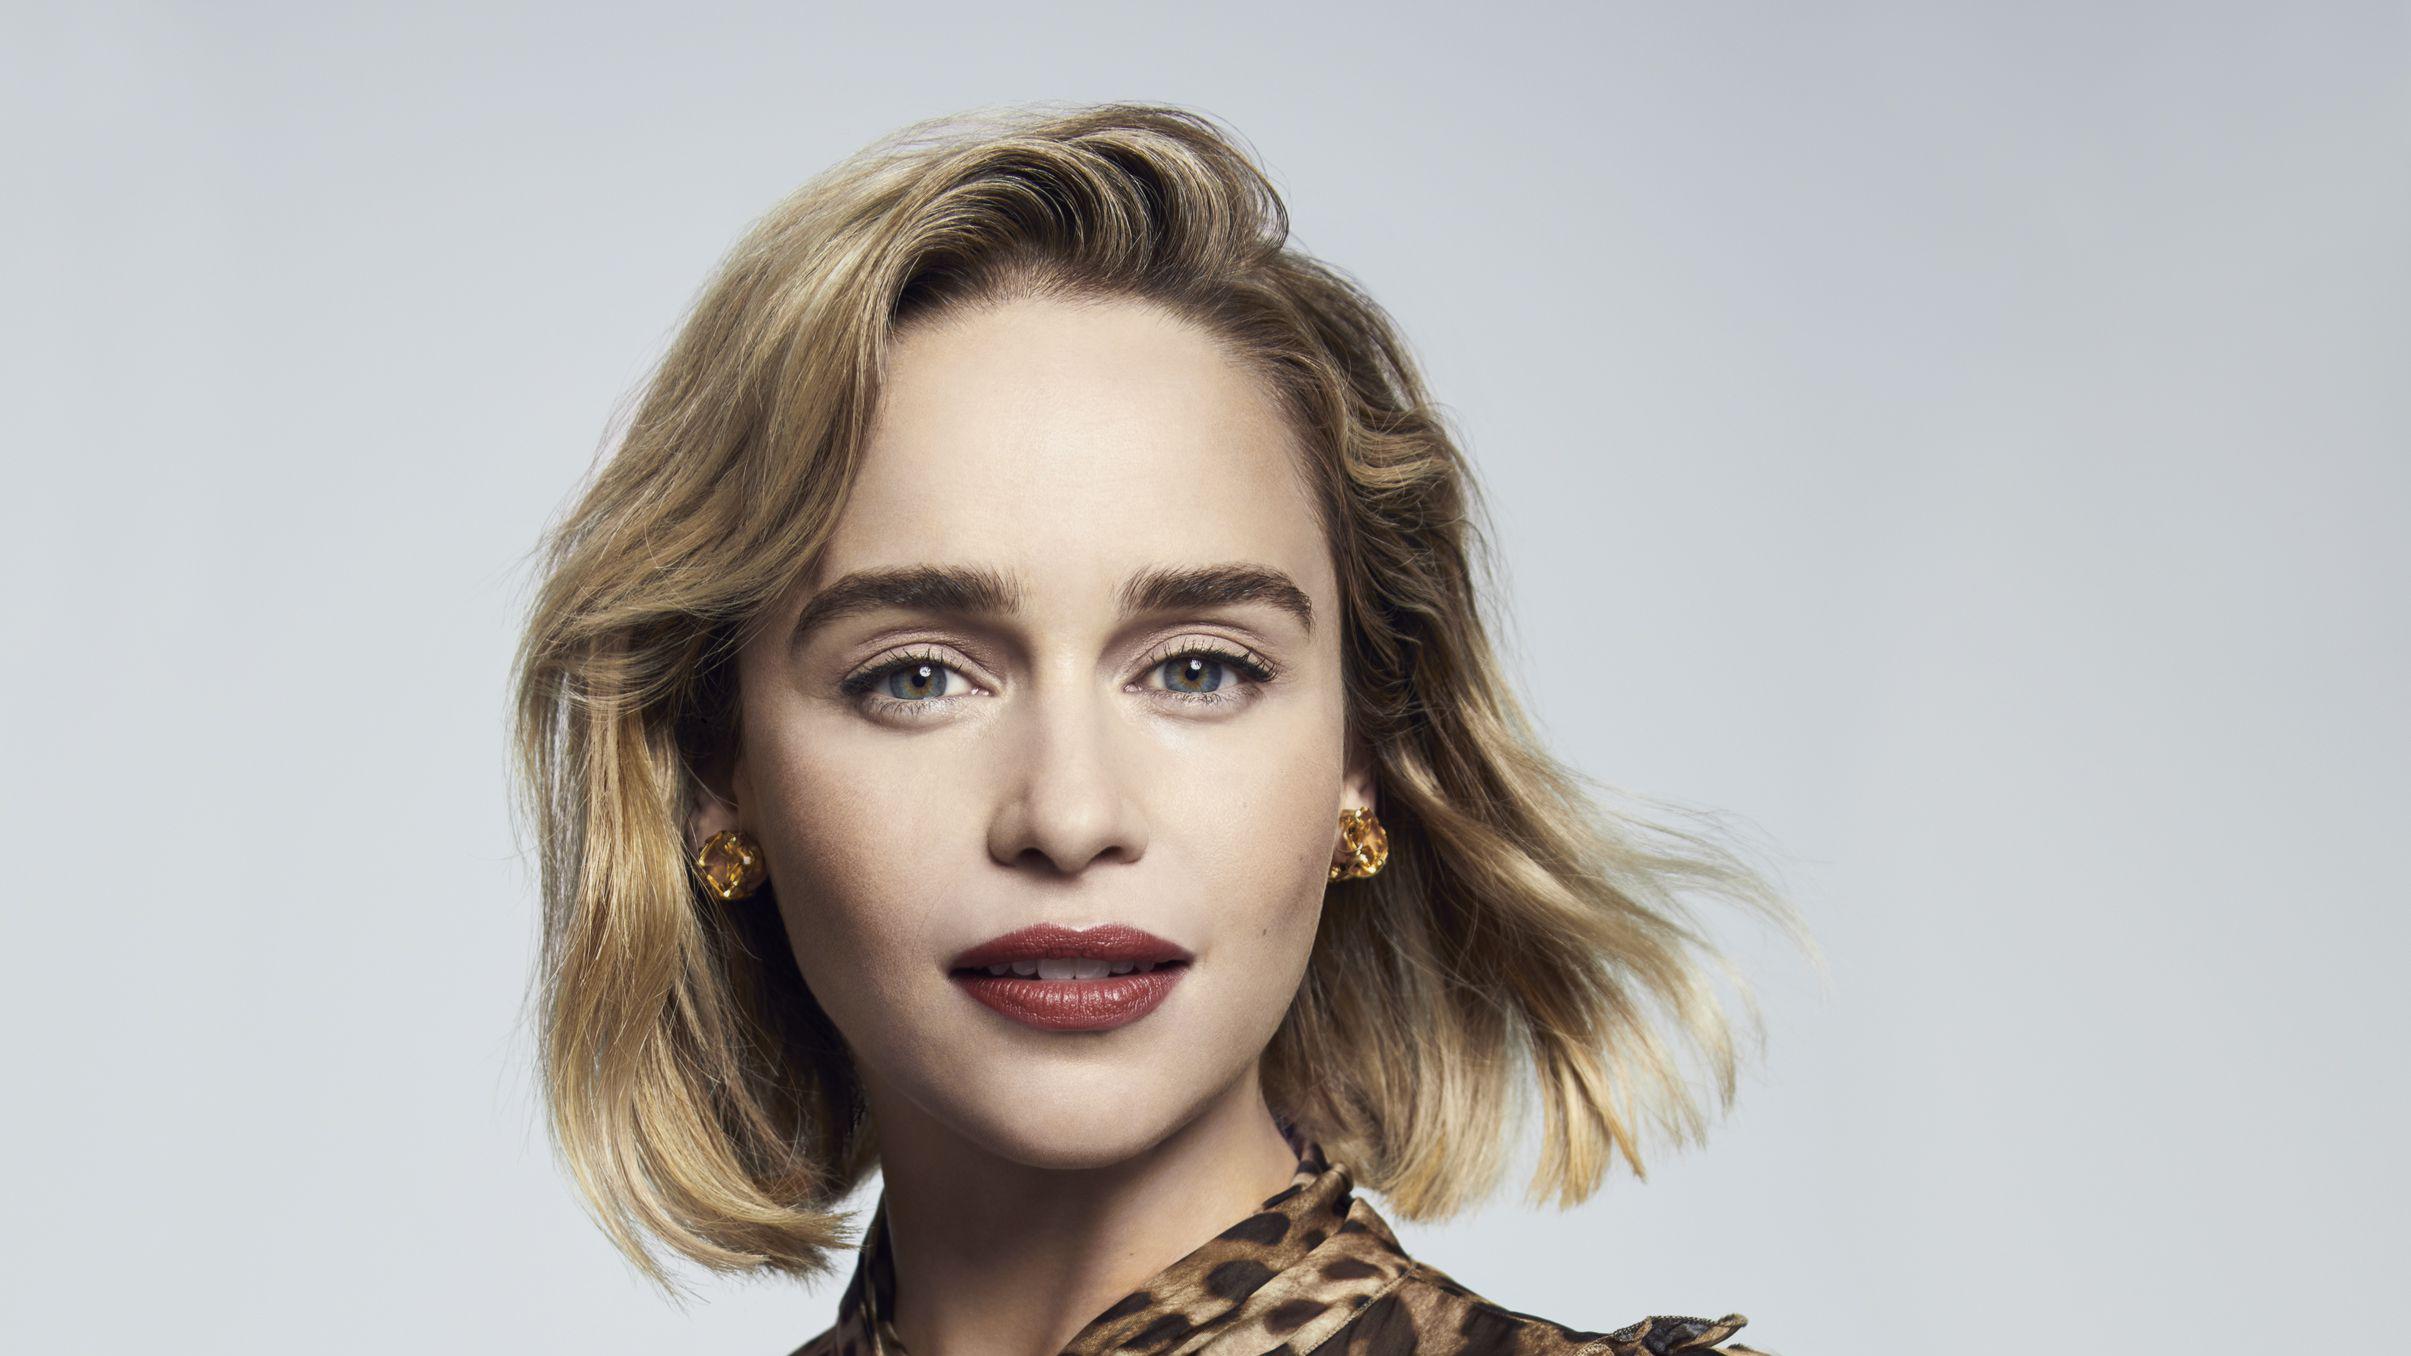 Emilia Clarke Fondo De Pantalla Hd Fondo De Escritorio